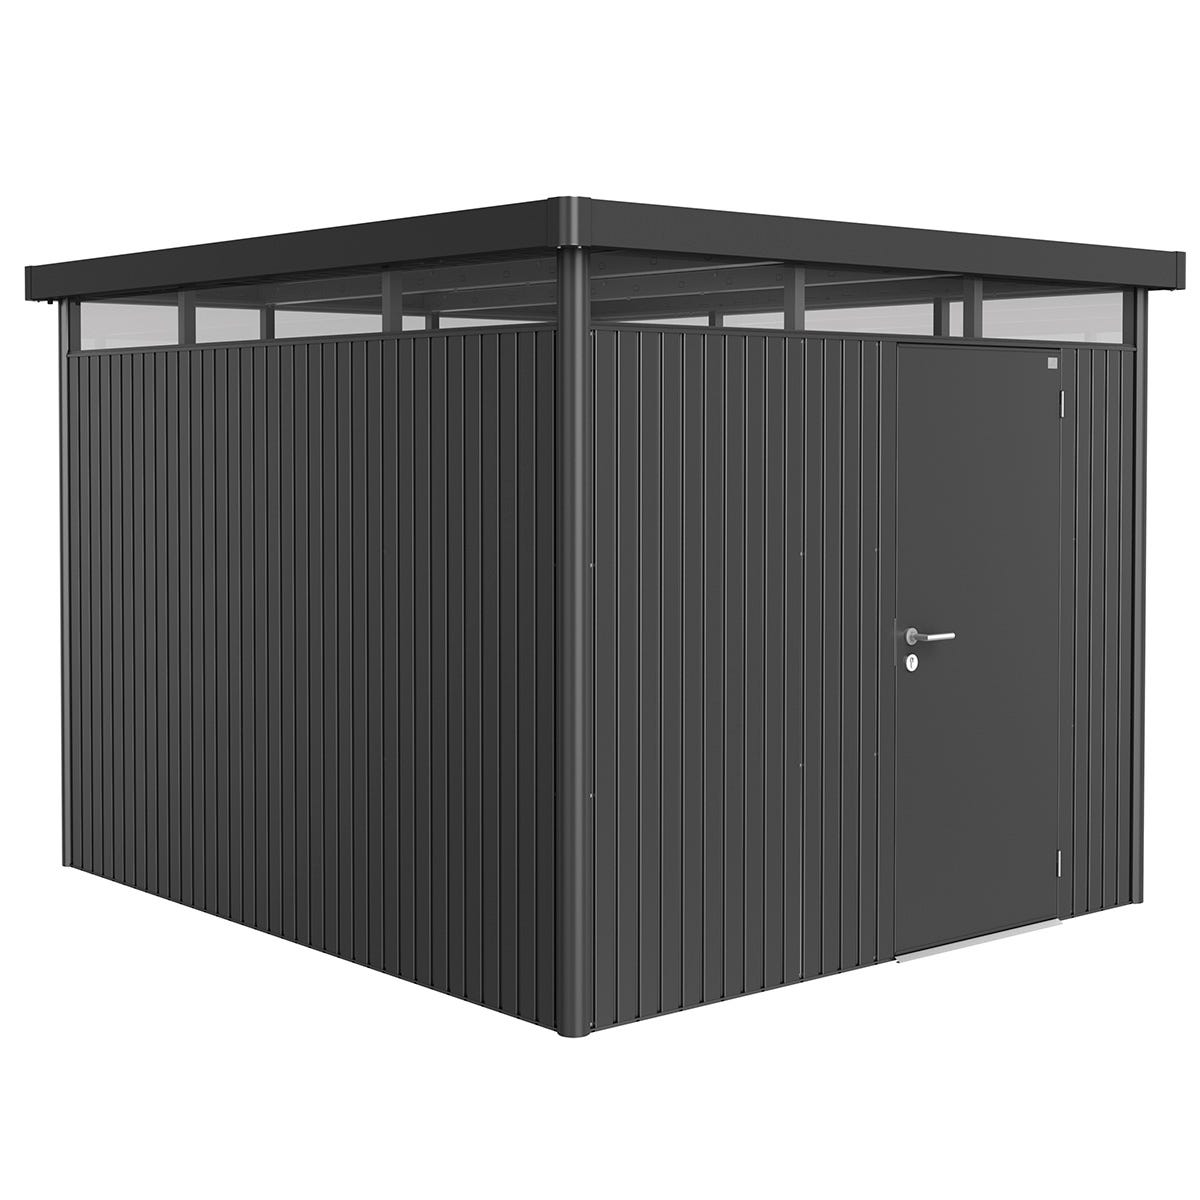 Biohort Highline Metal Shed H5 Standard door 9 x 10 - Dark Grey